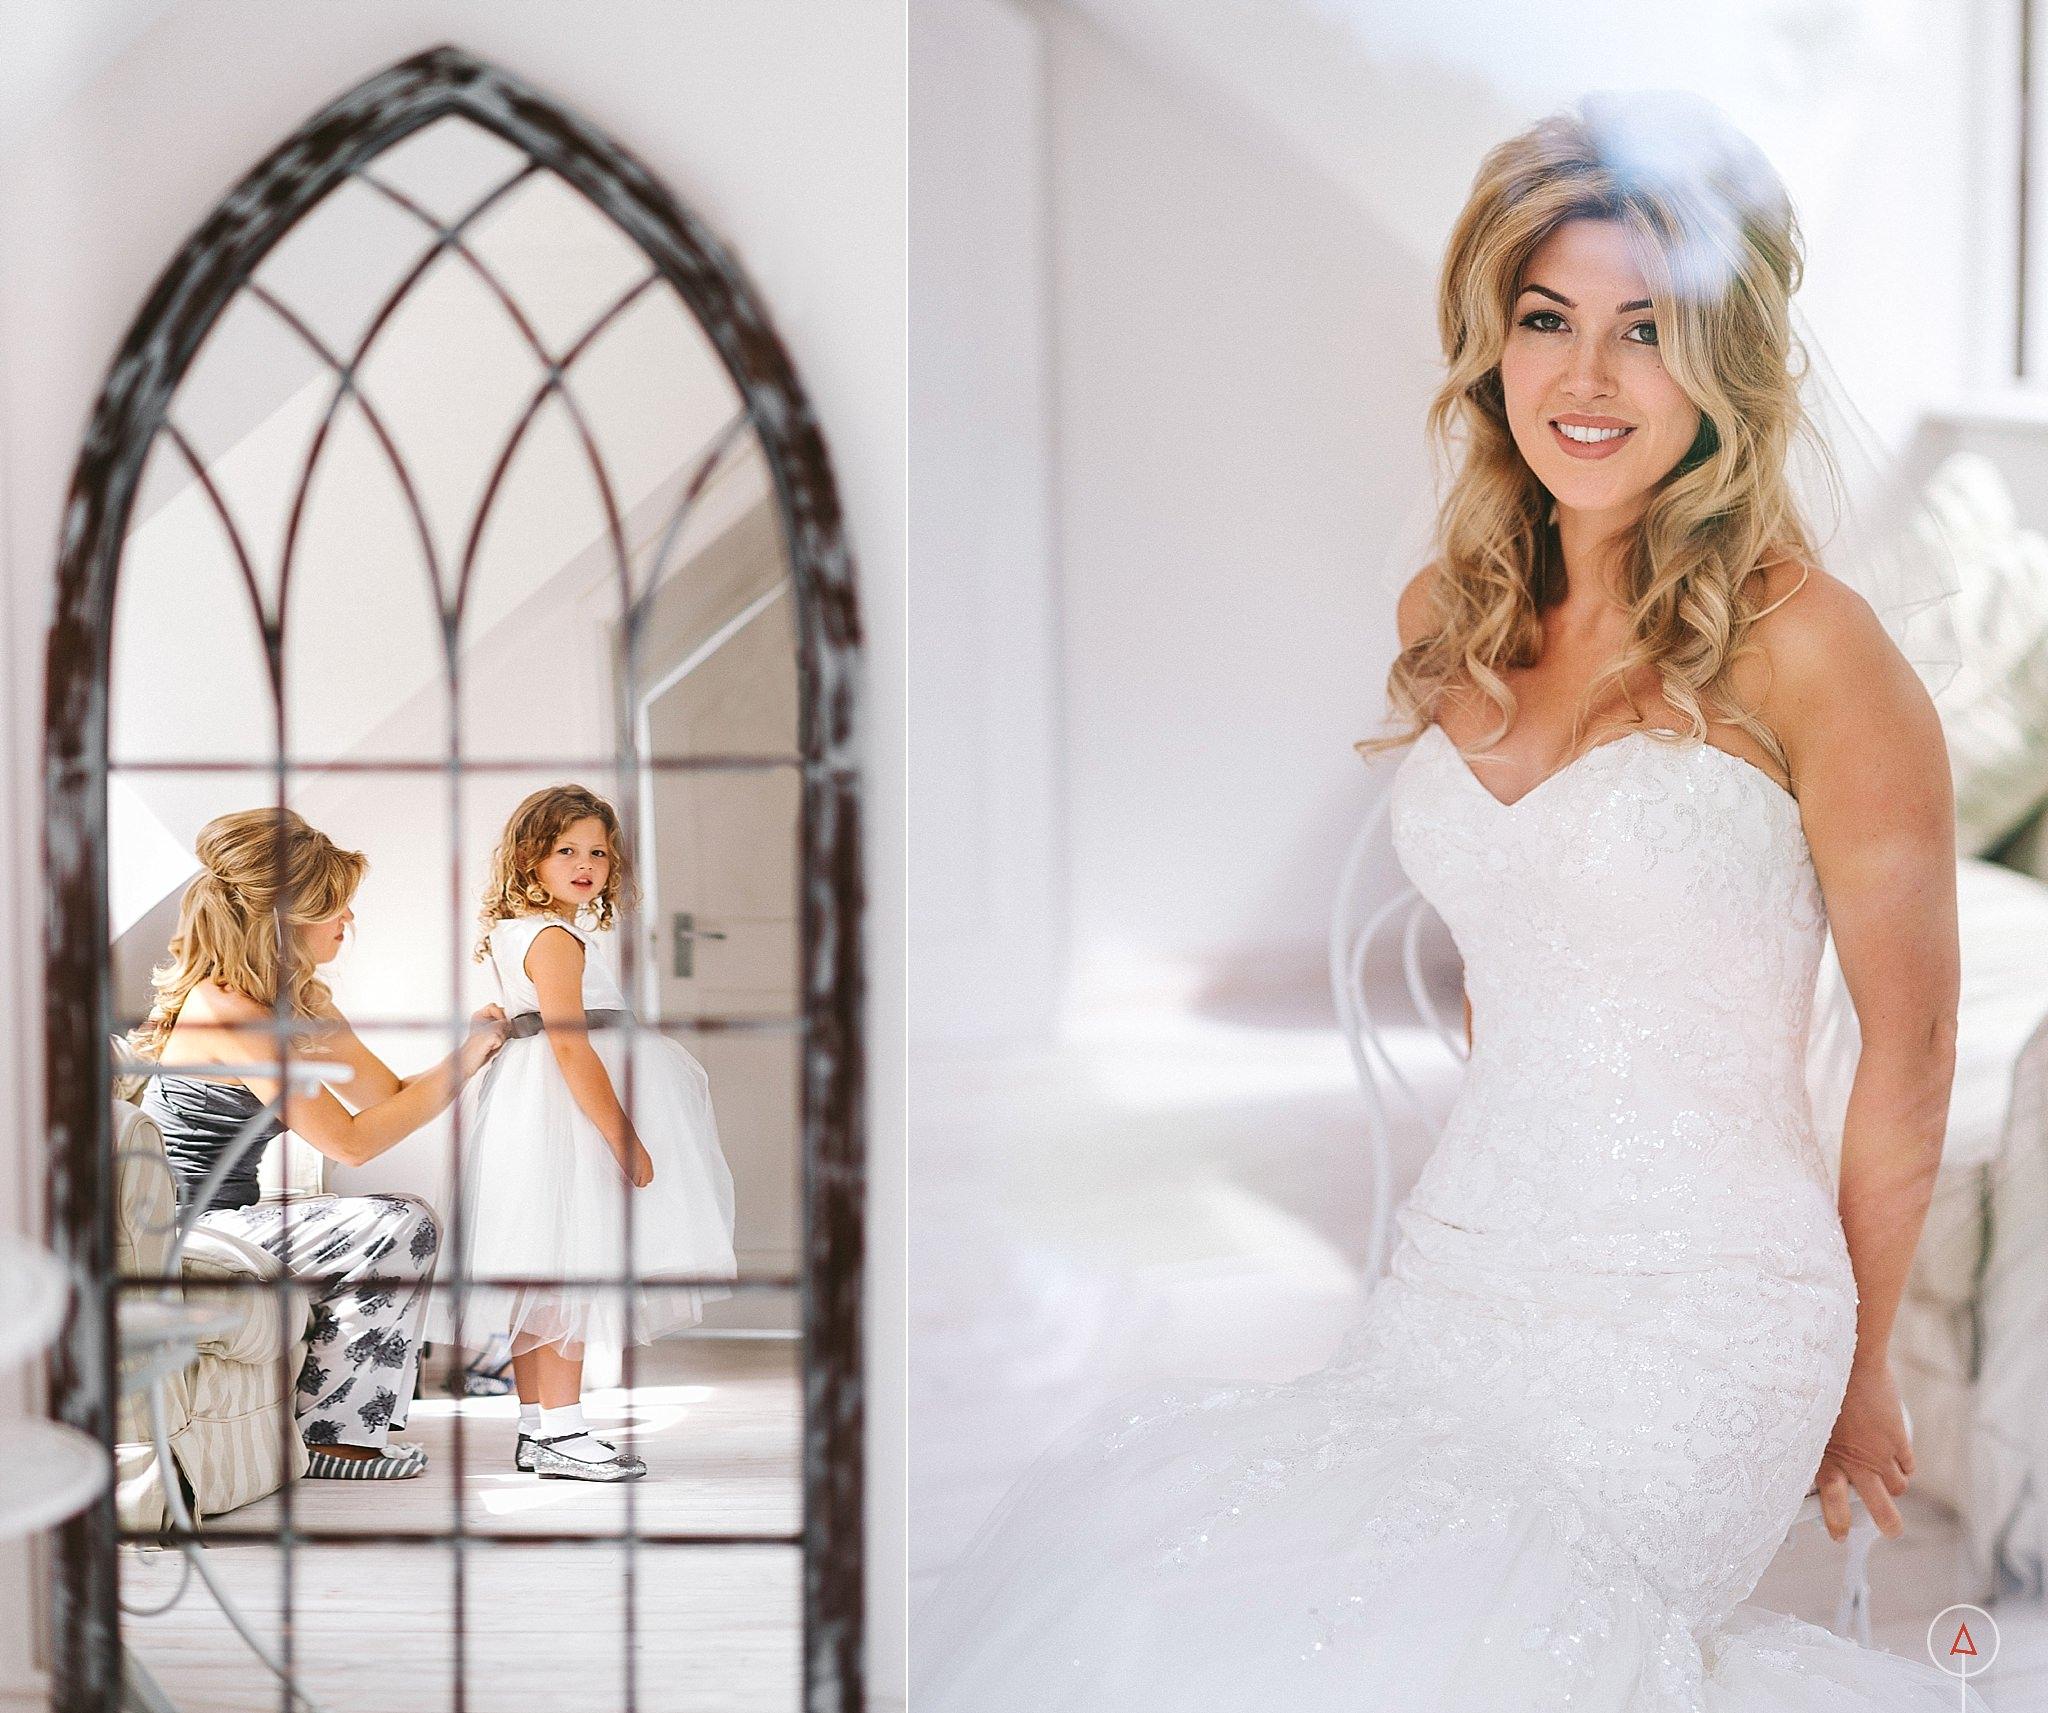 cardiff-wedding-photographer-aga-tomaszek_0315